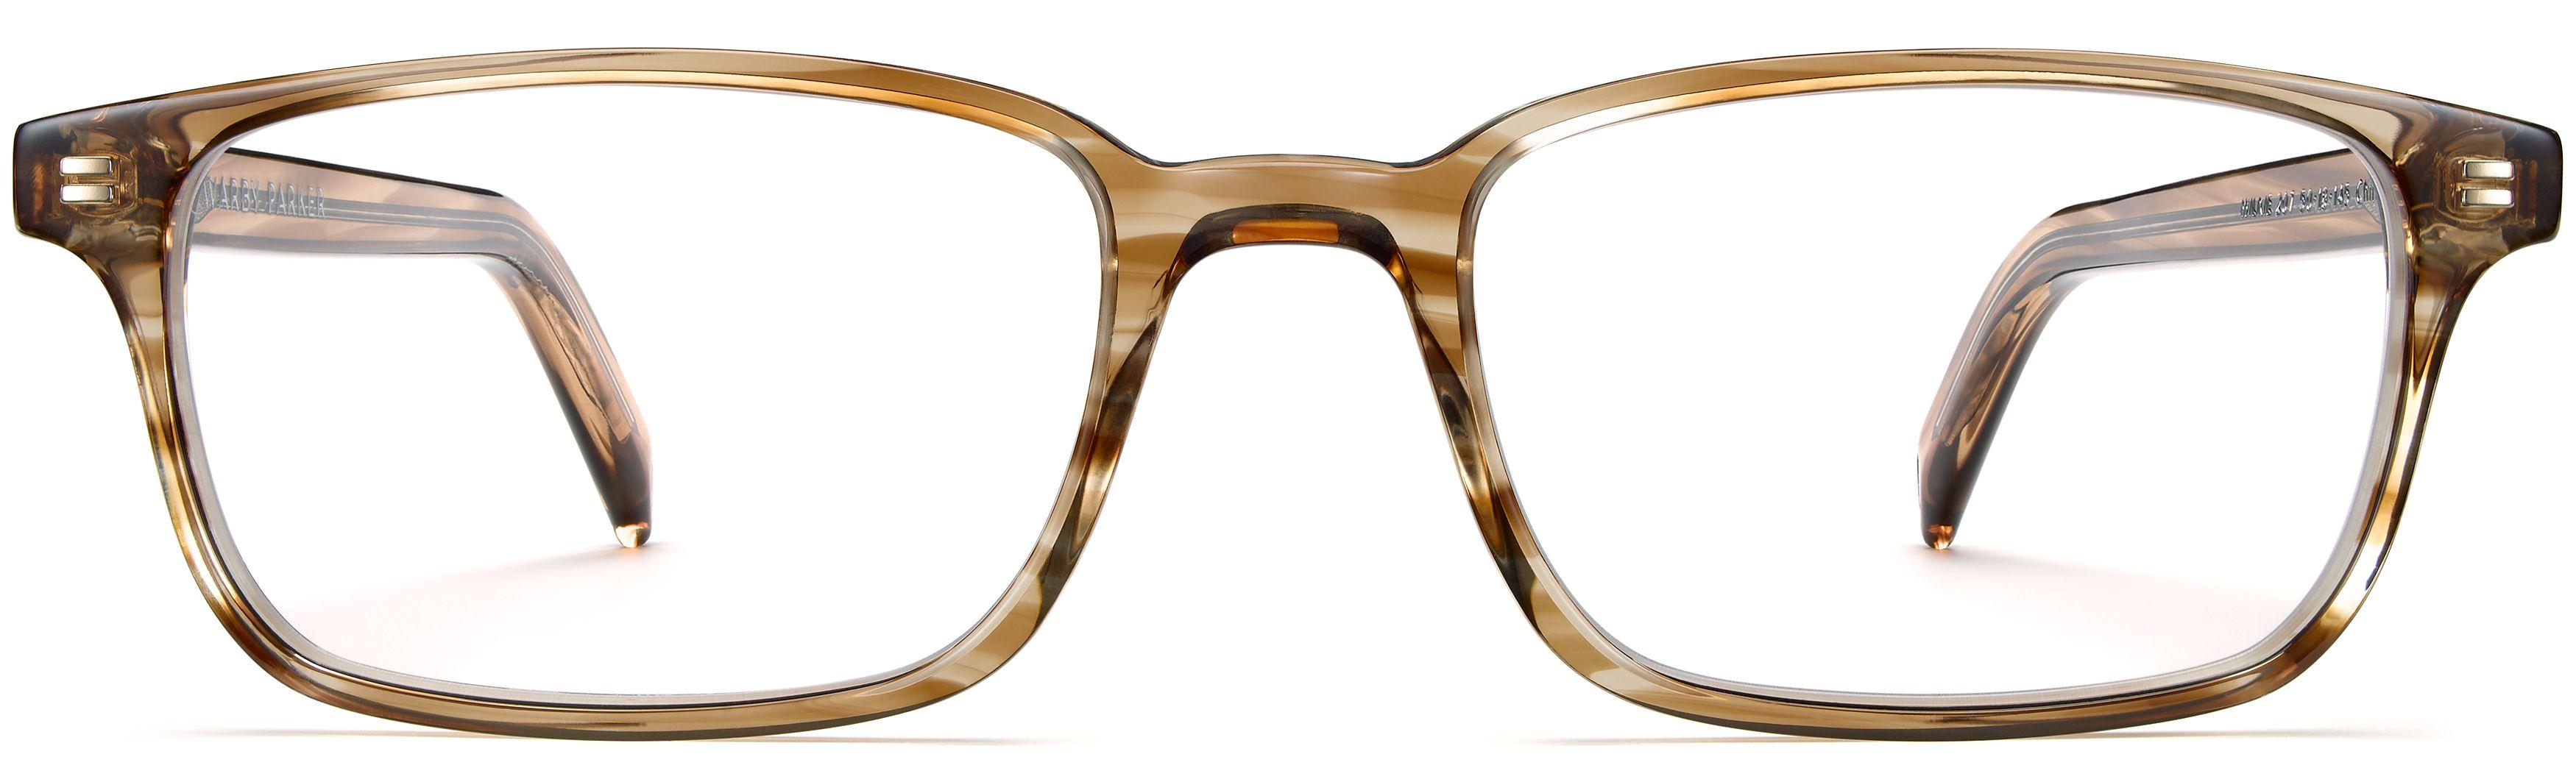 f7f322050d5 Wilkie Eyeglasses in Chestnut Crystal for Women